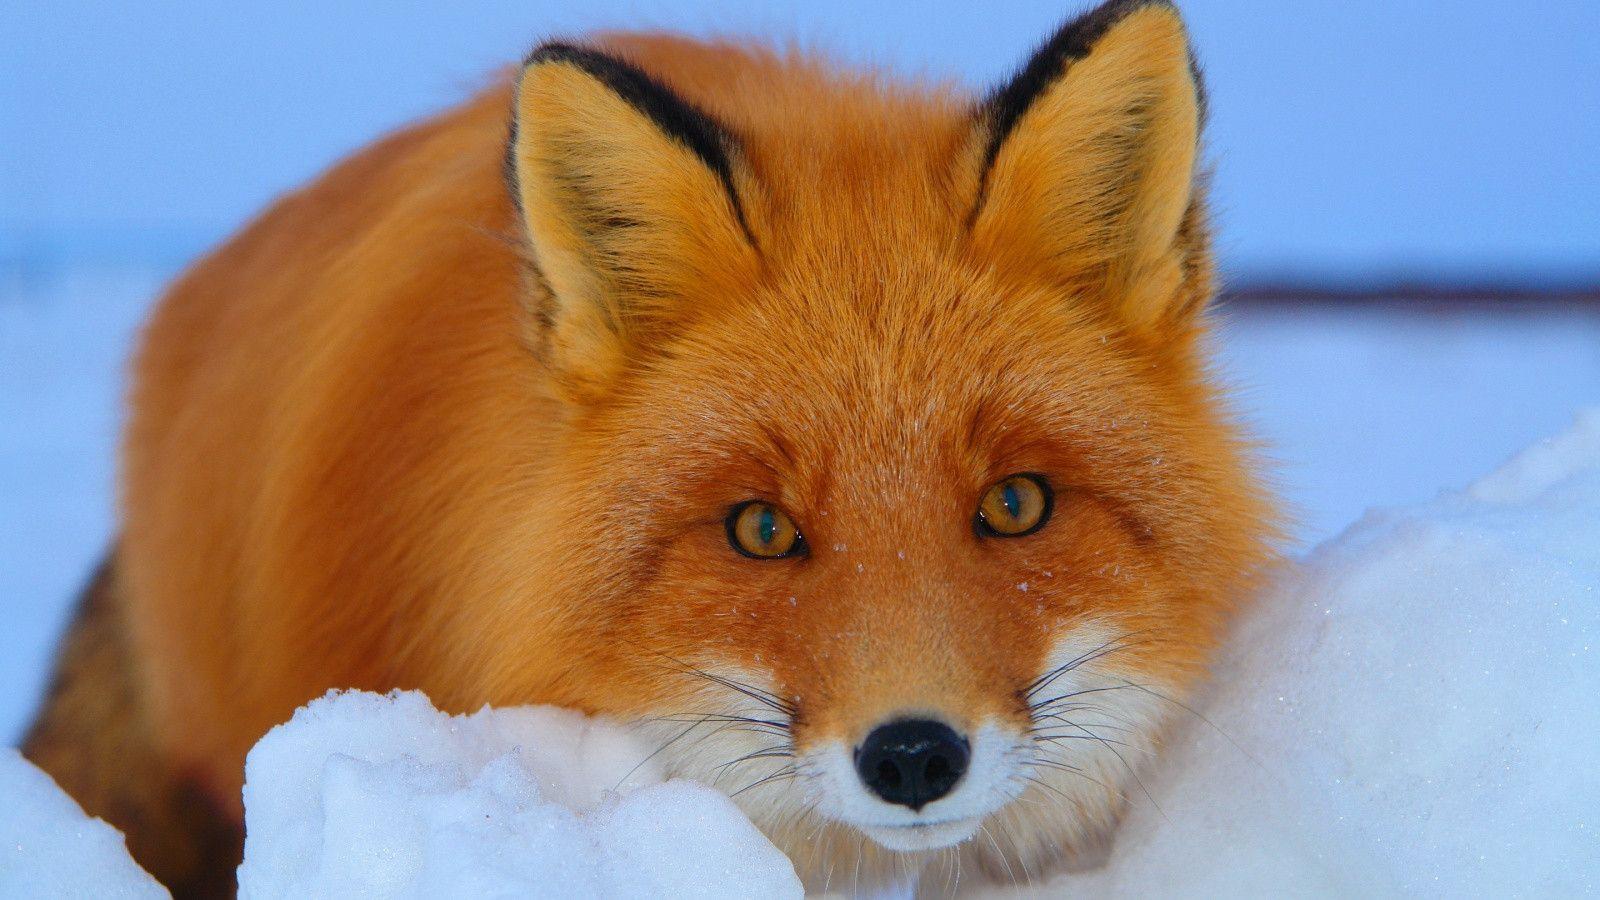 1600x900 Red fox Wallpaper